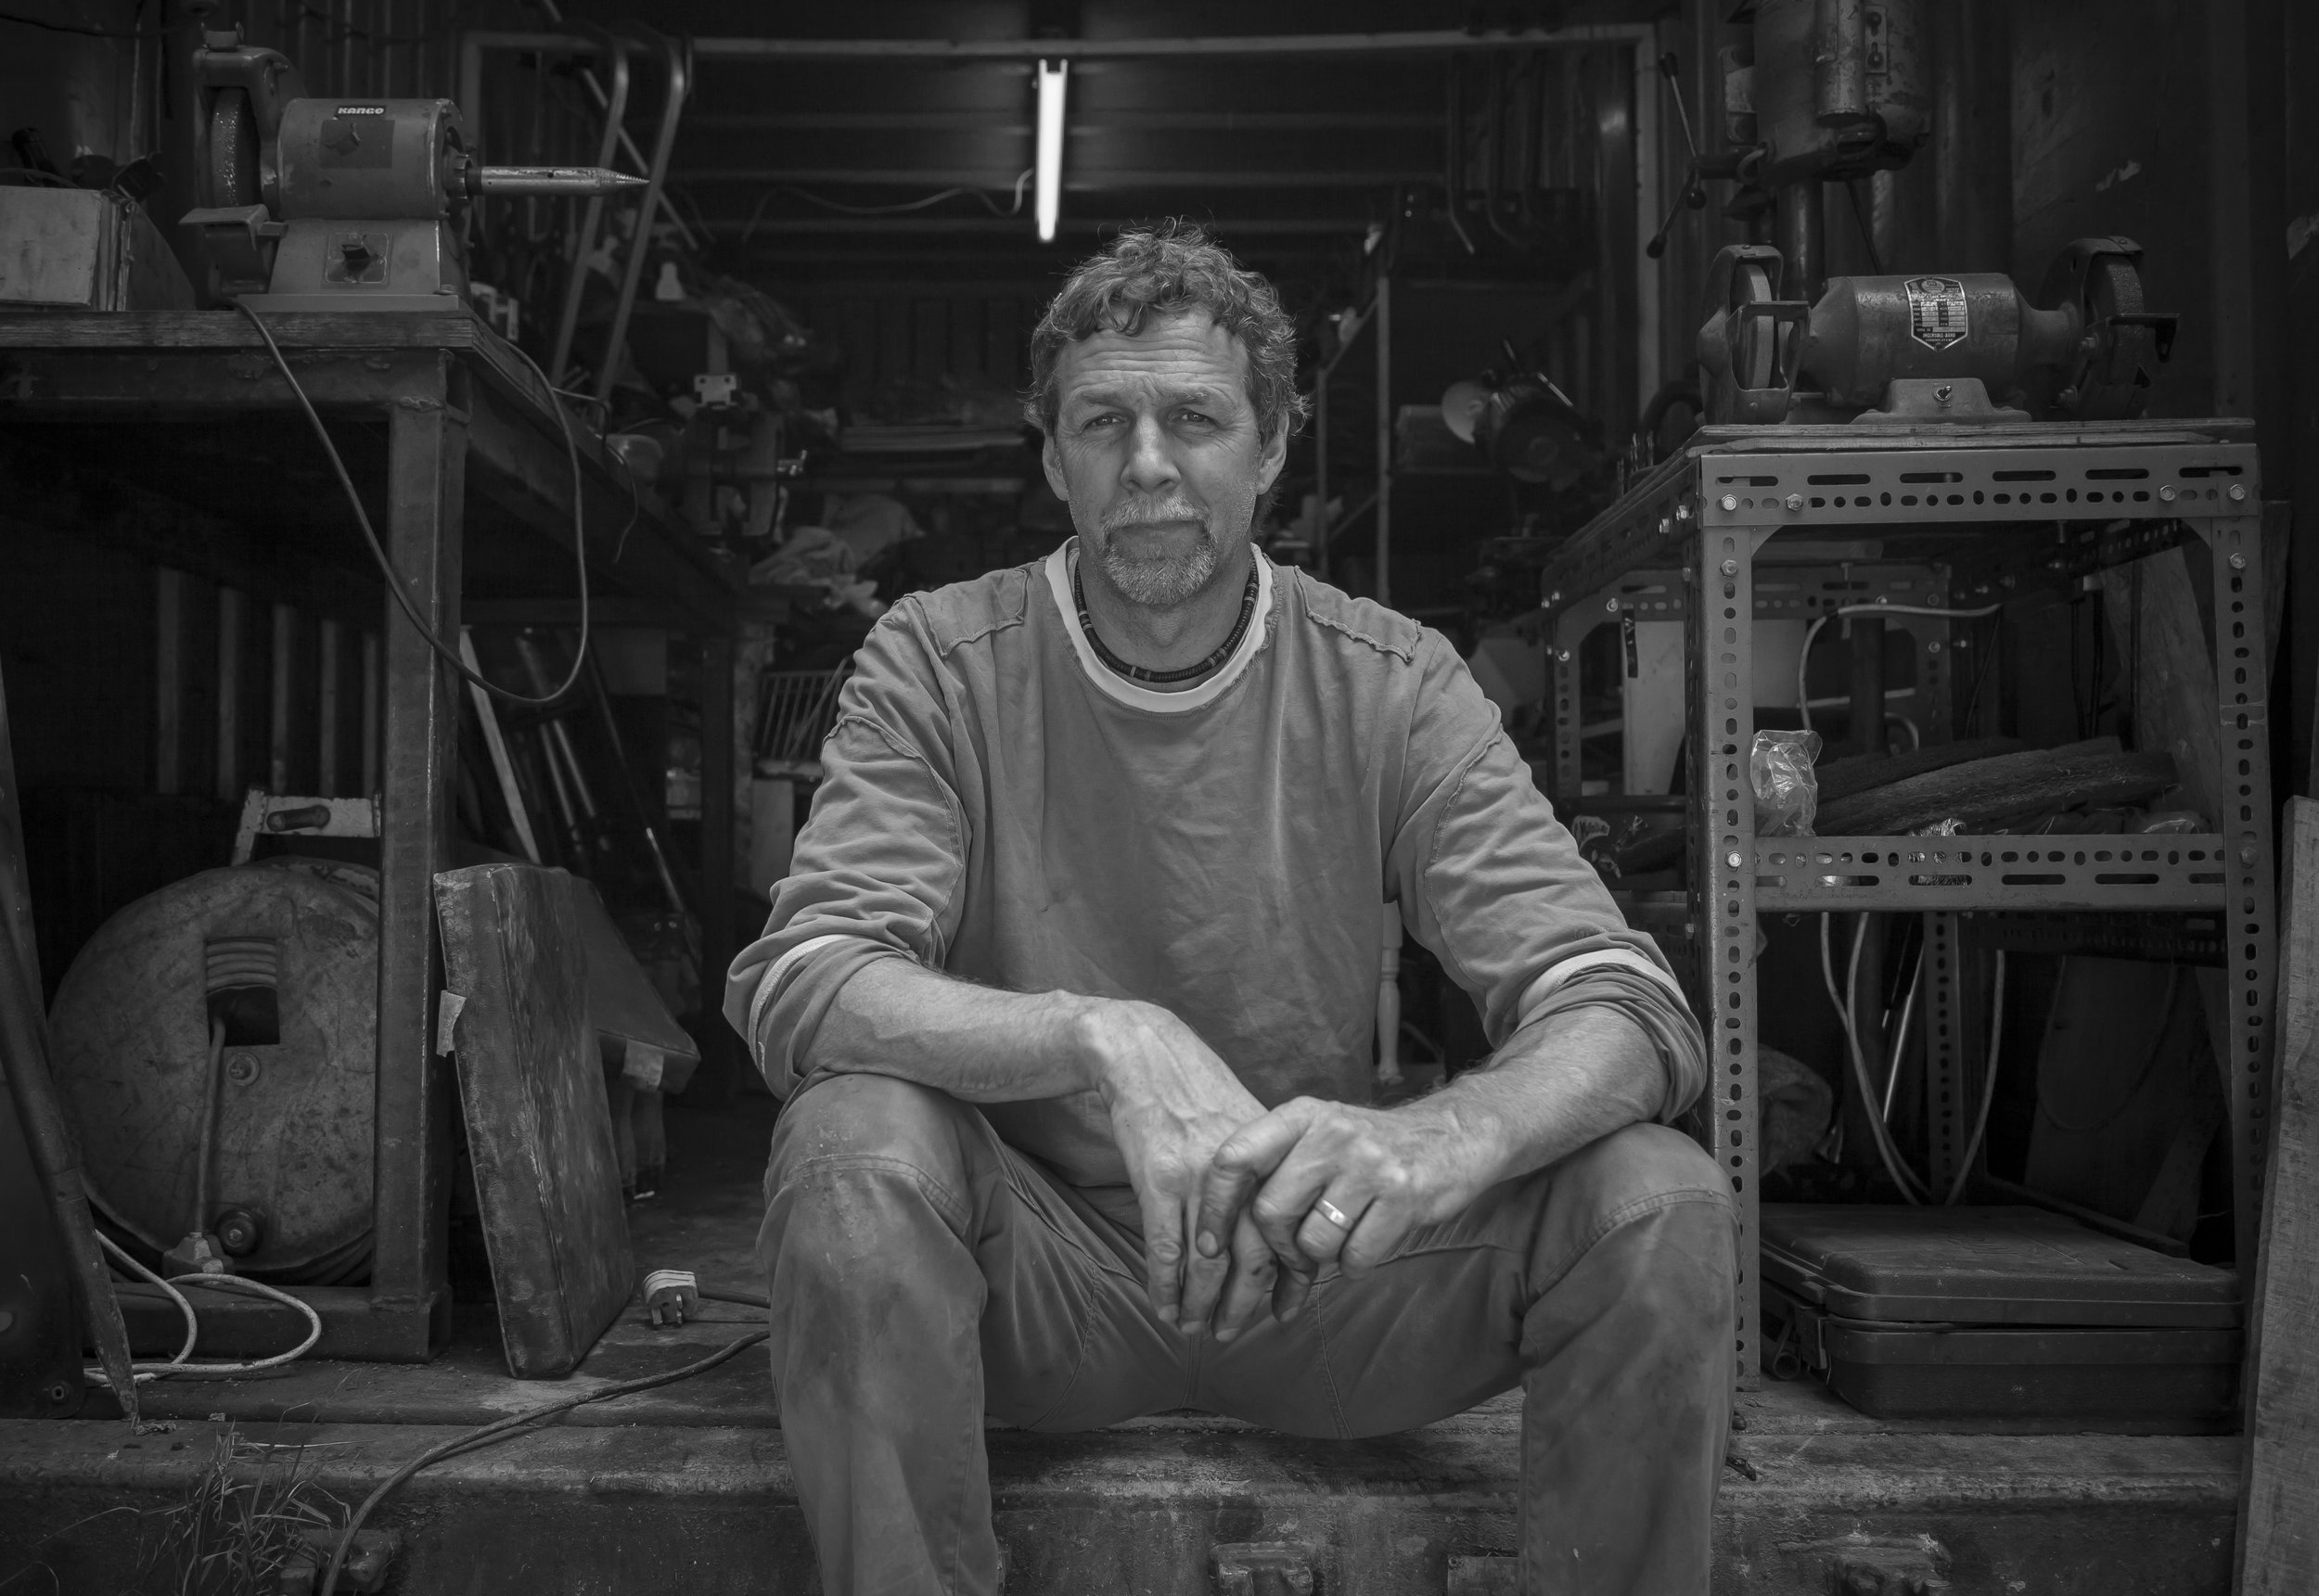 Paul Derek - Handyman